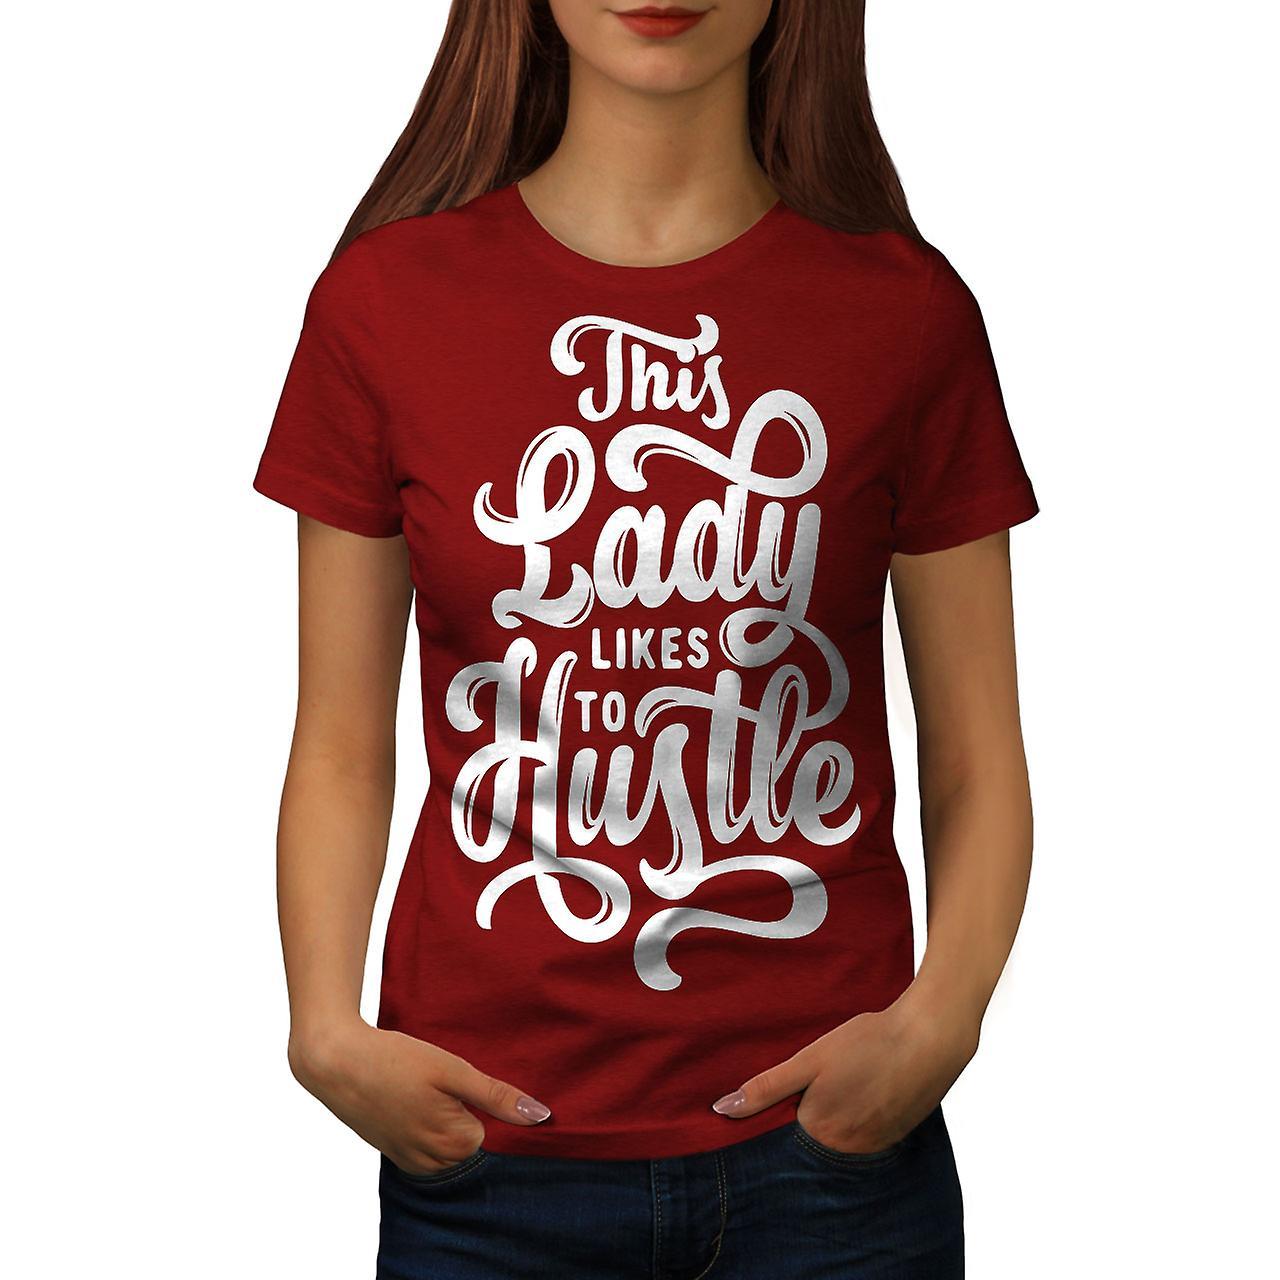 hustler women Find great deals on ebay for hustler women shop with confidence.